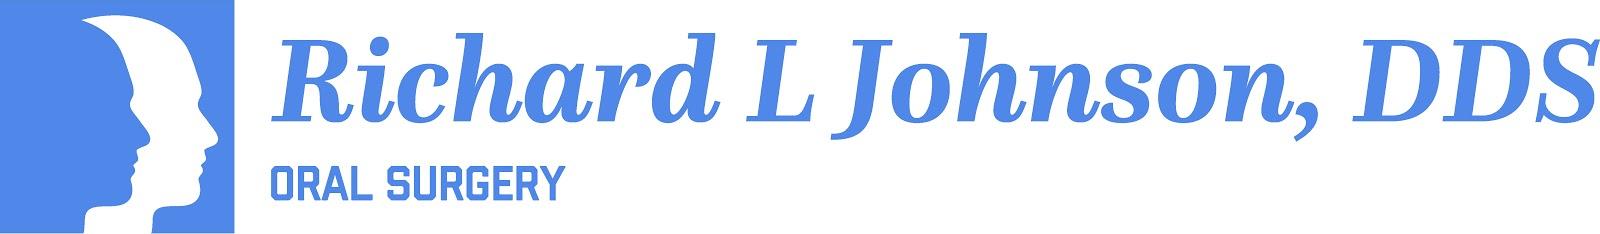 color_logo_transparent.jpg